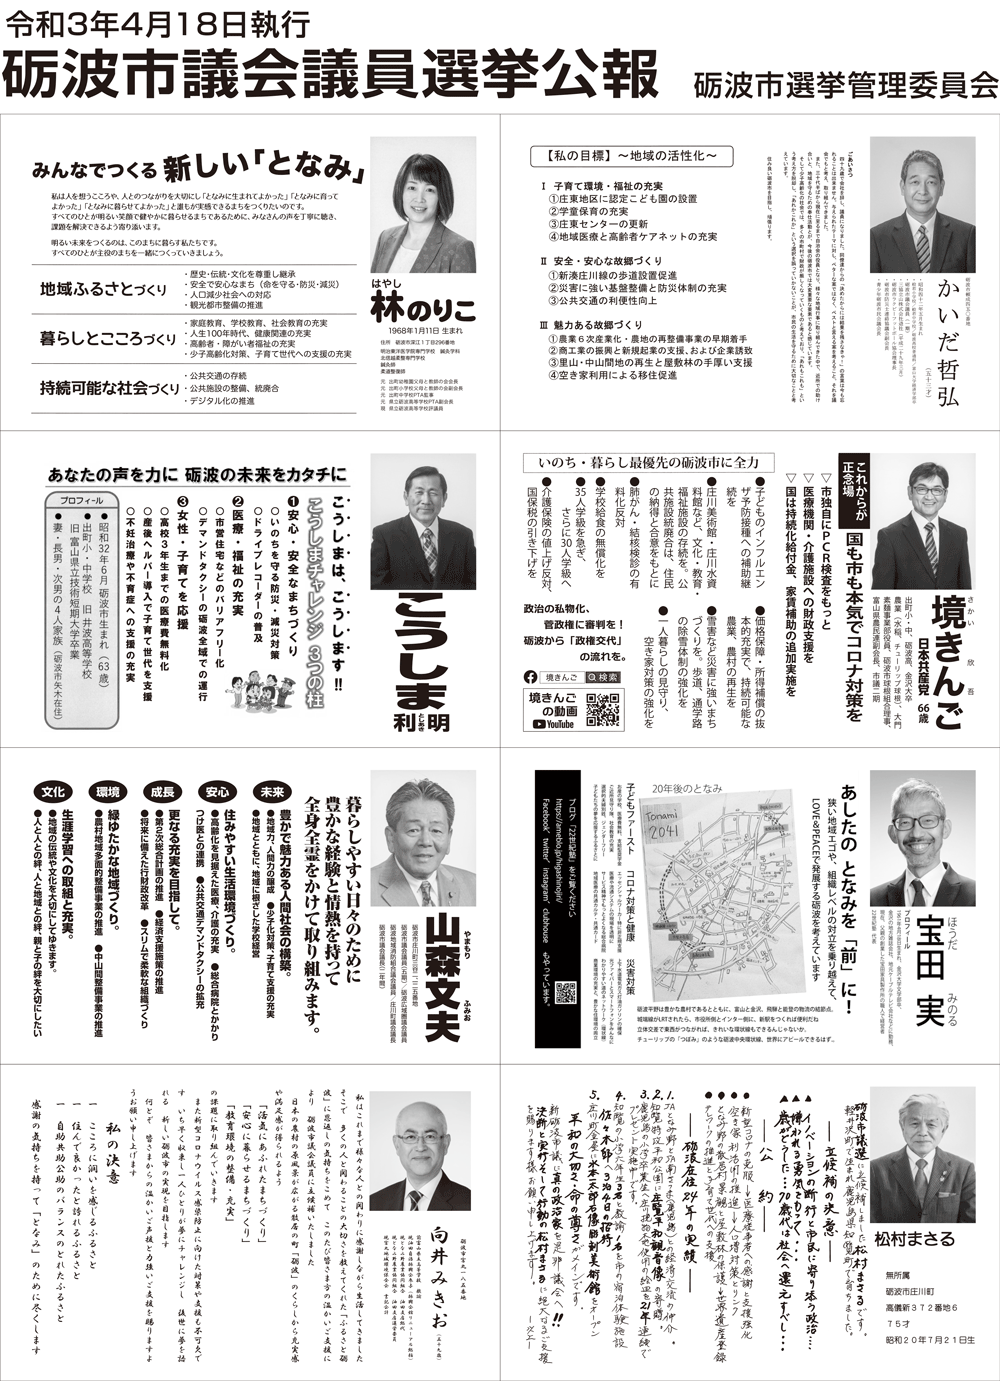 砺波市議会議員選挙2021の選挙公報2